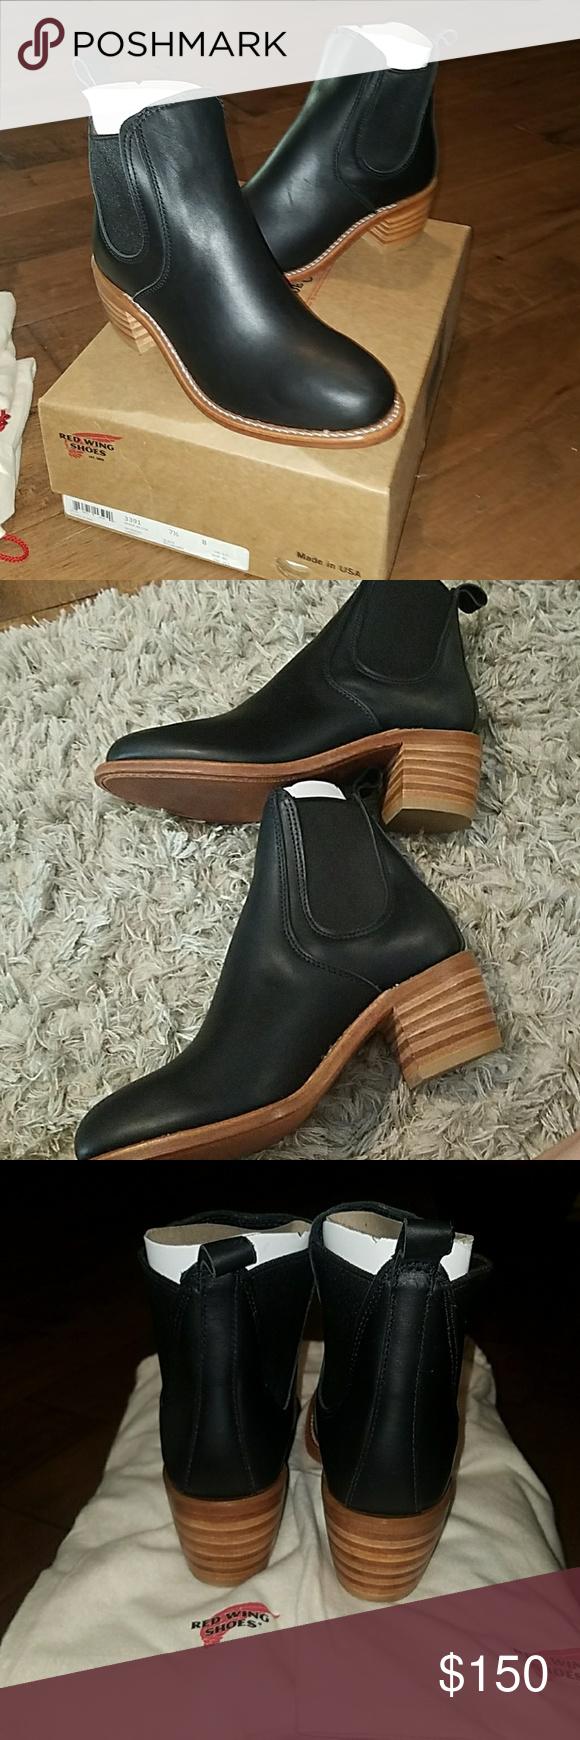 Redwing women's Harriet boots